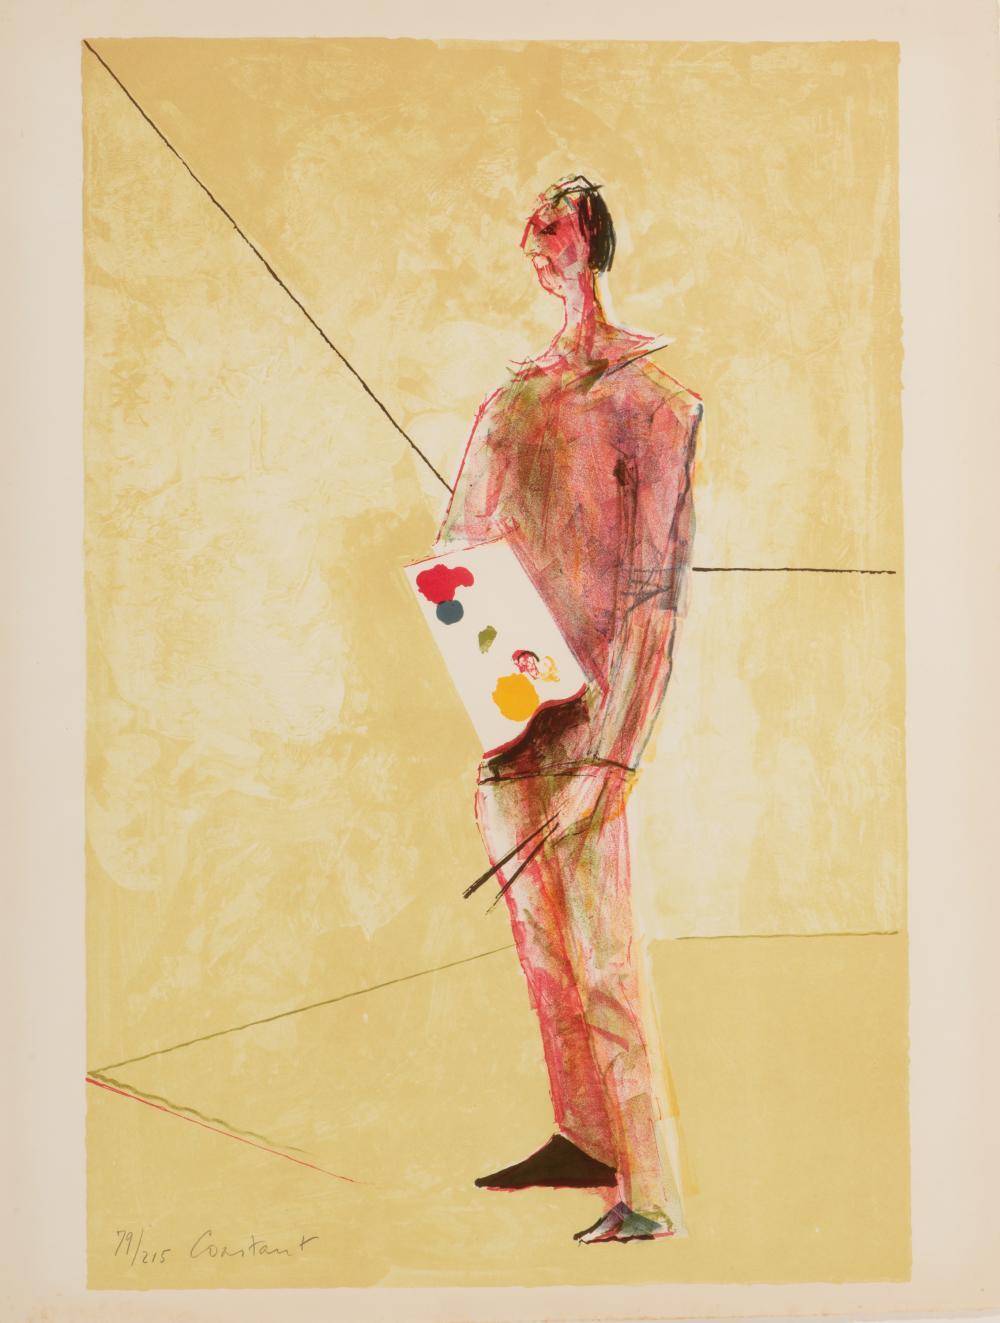 Zelfportret (Self-portrait), 1977.